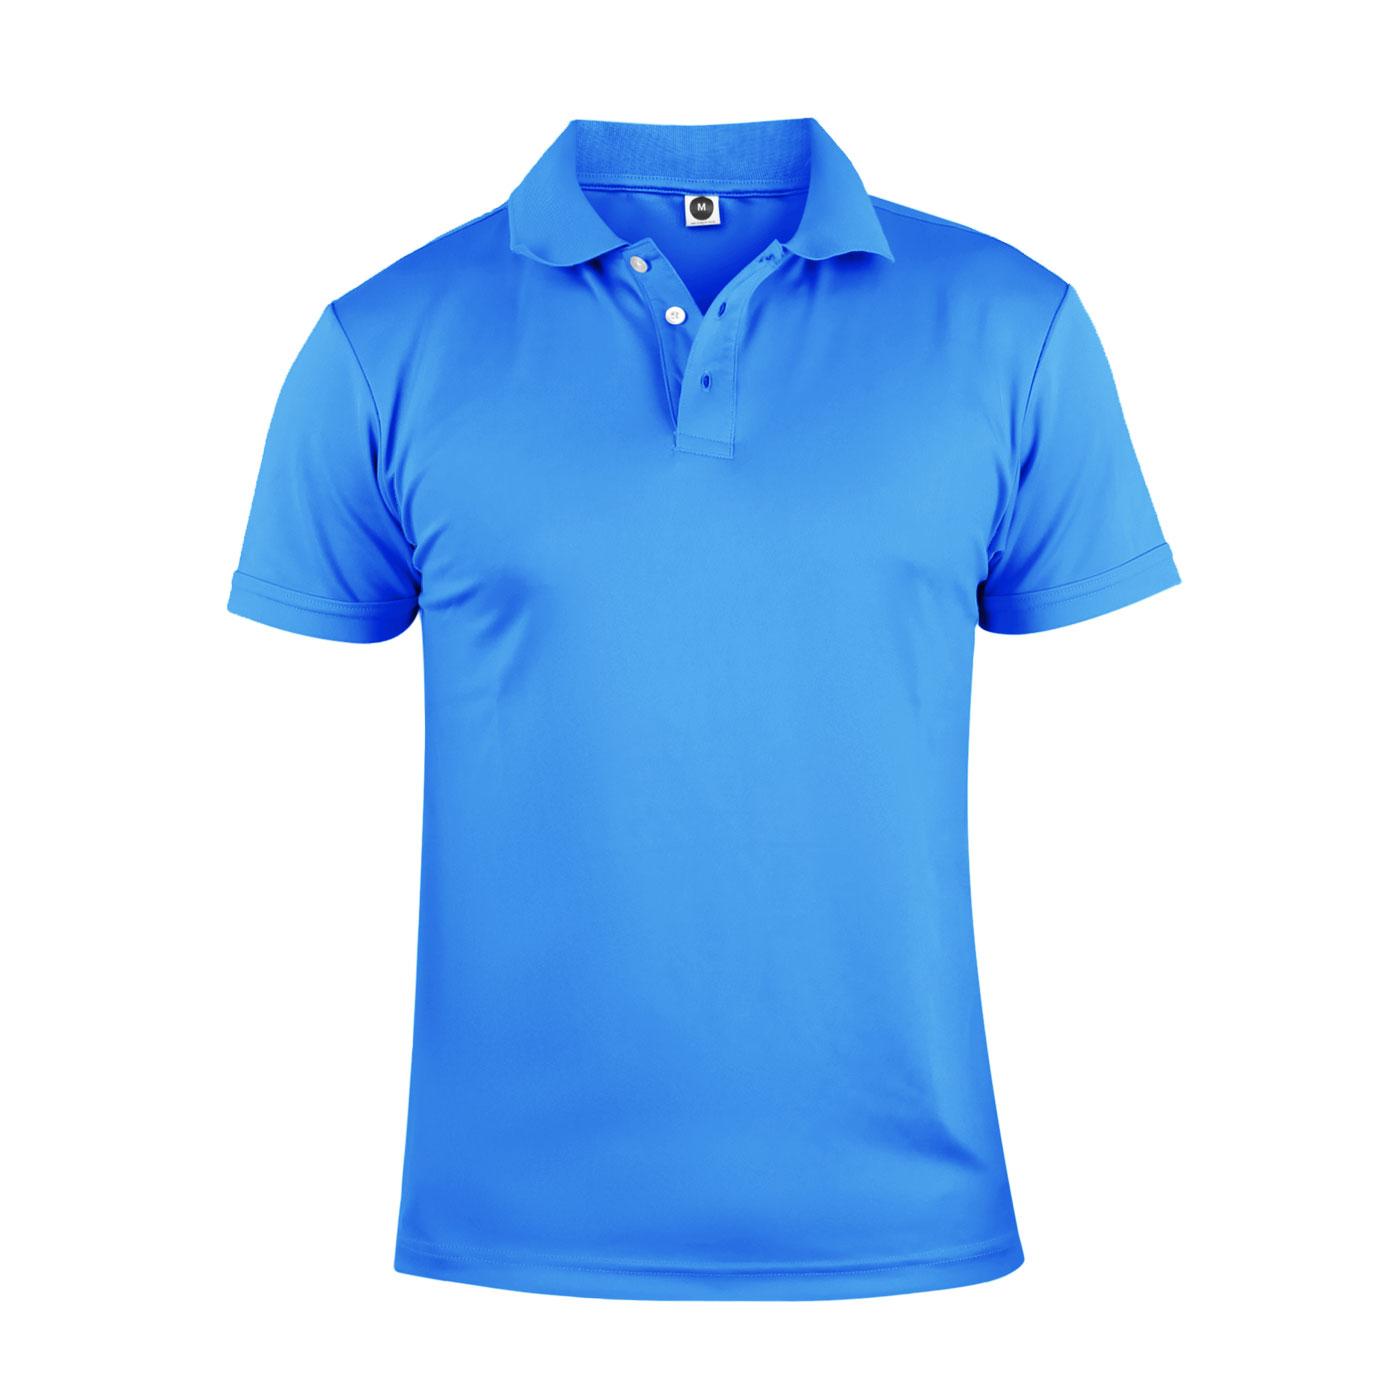 HODARLA 彈力涼感短袖POLO衫 3113901 - 亮藍